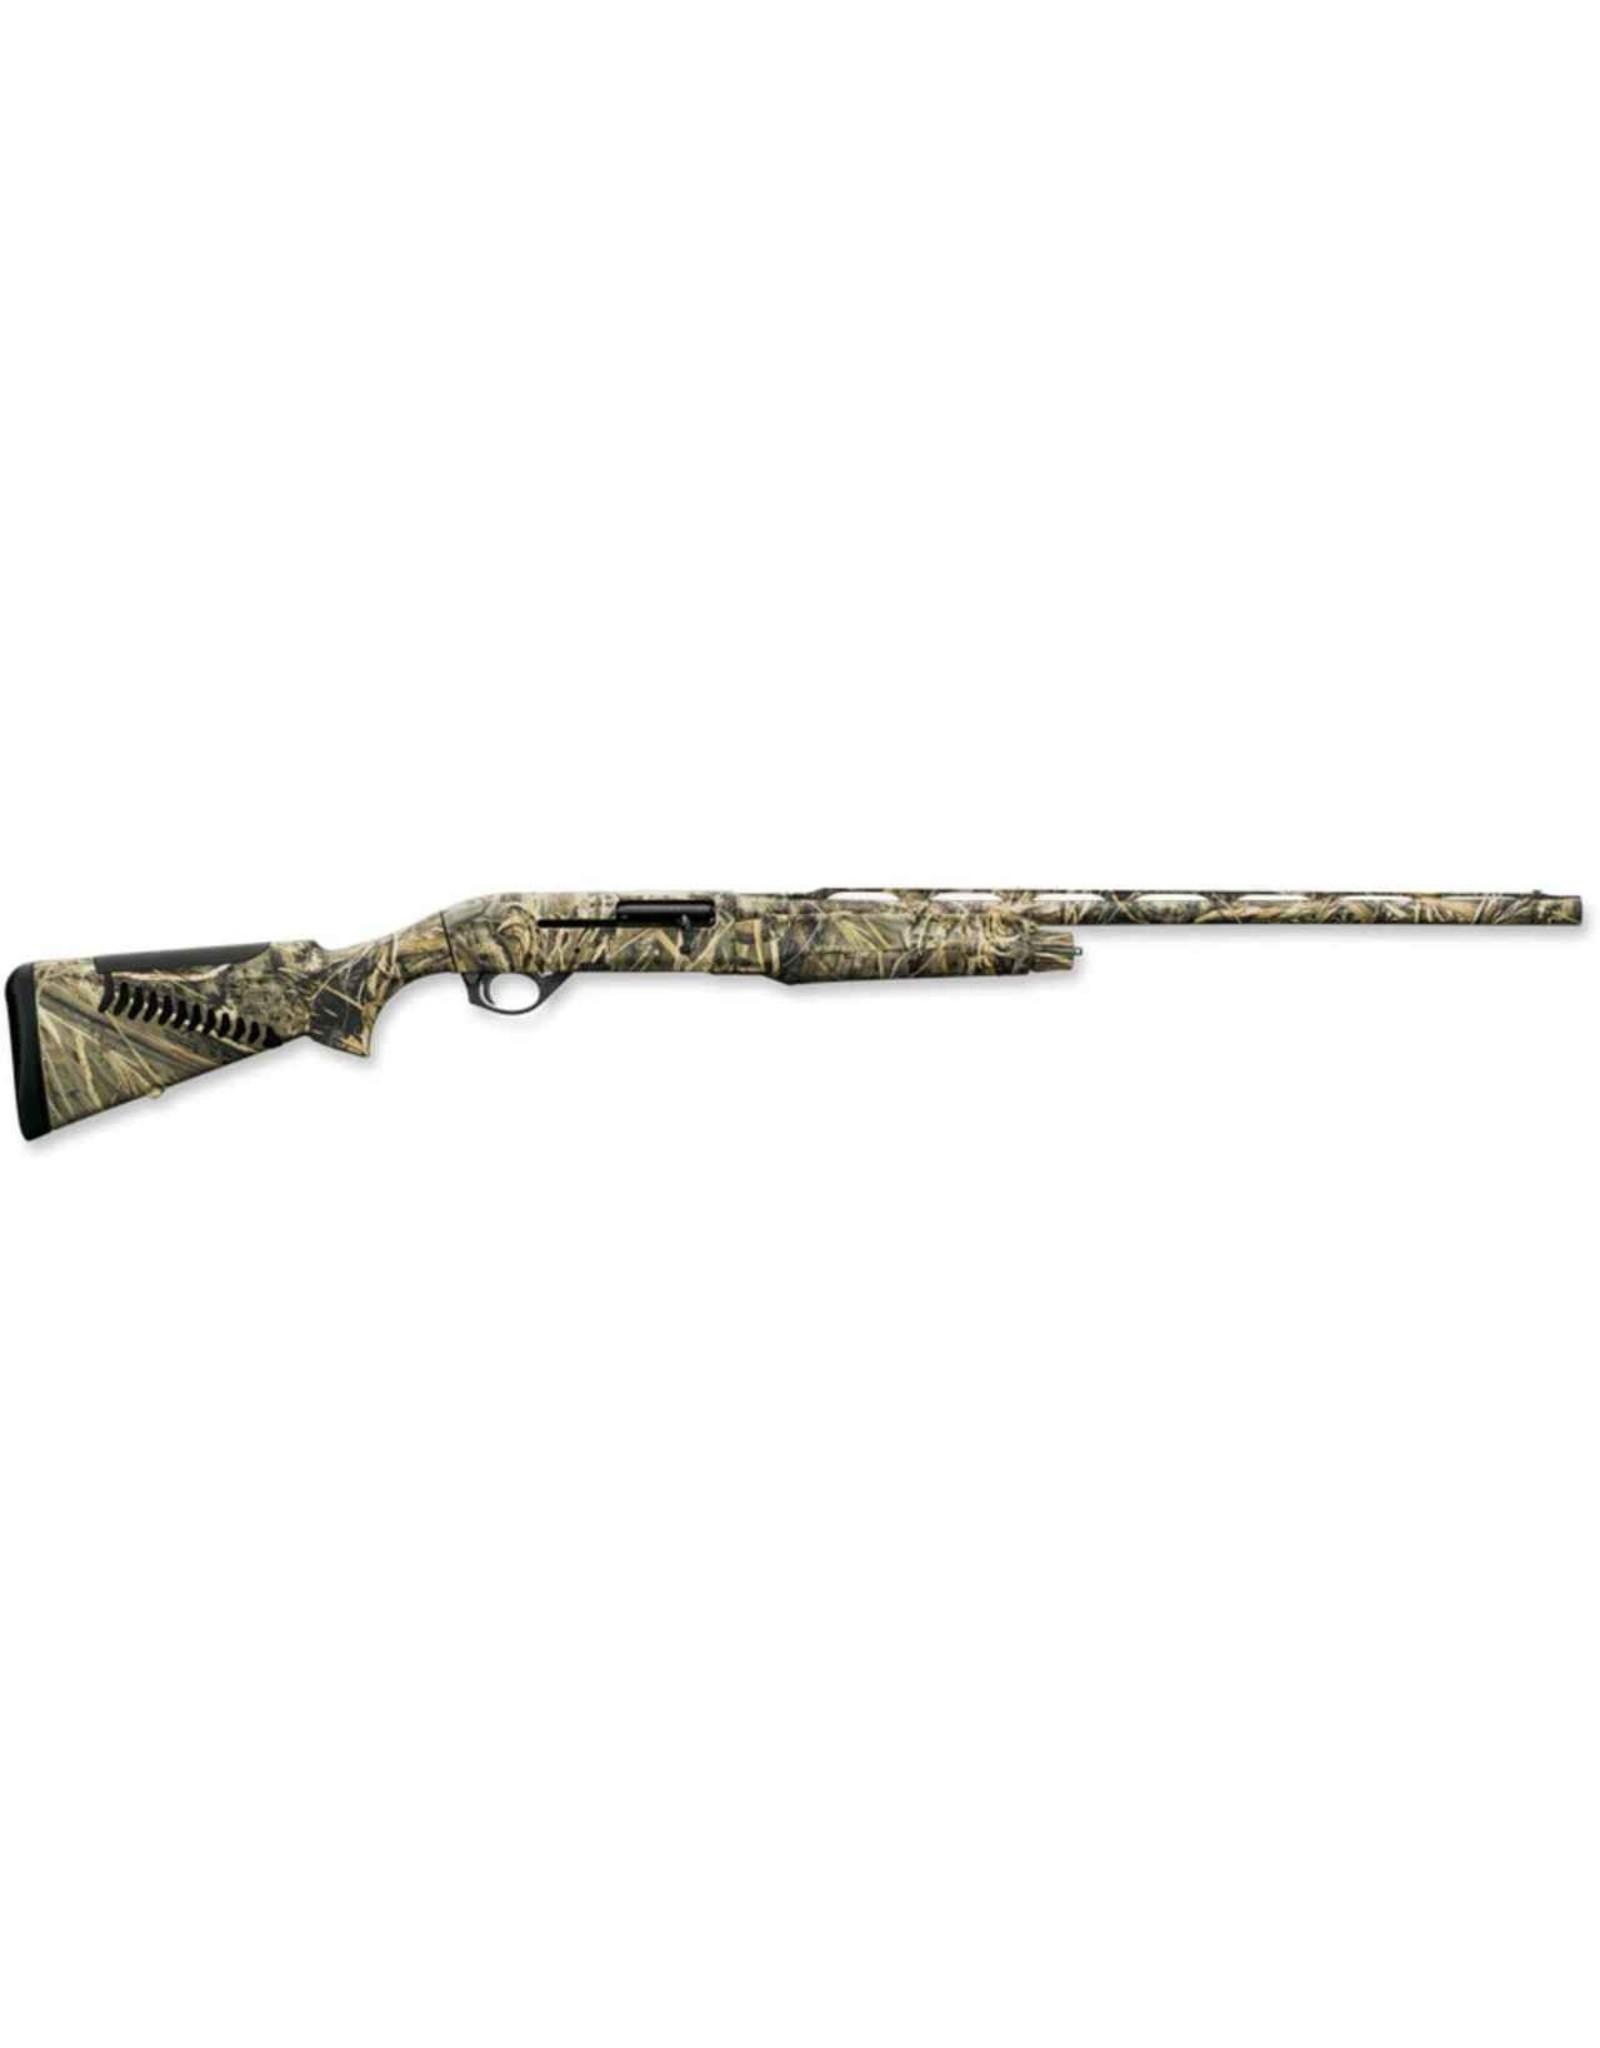 "Benelli M2 12ga 28"" bbl Mossy Oak Shadow Grass Blades Camo"